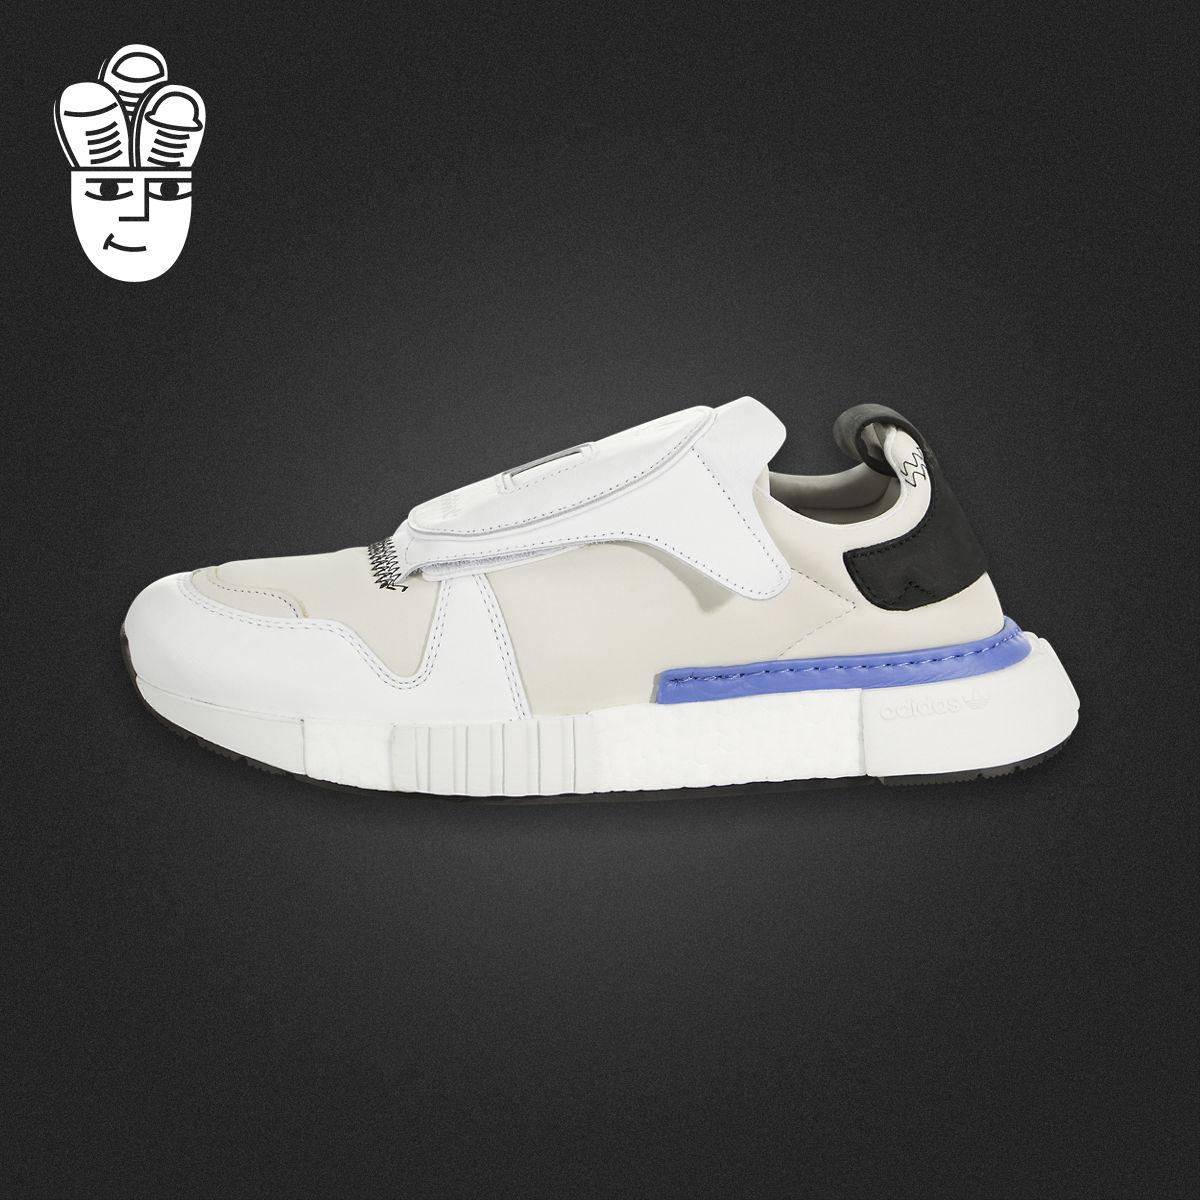 Adidas Futurepacer 阿迪达斯男子运动鞋 时尚复古风跑步鞋